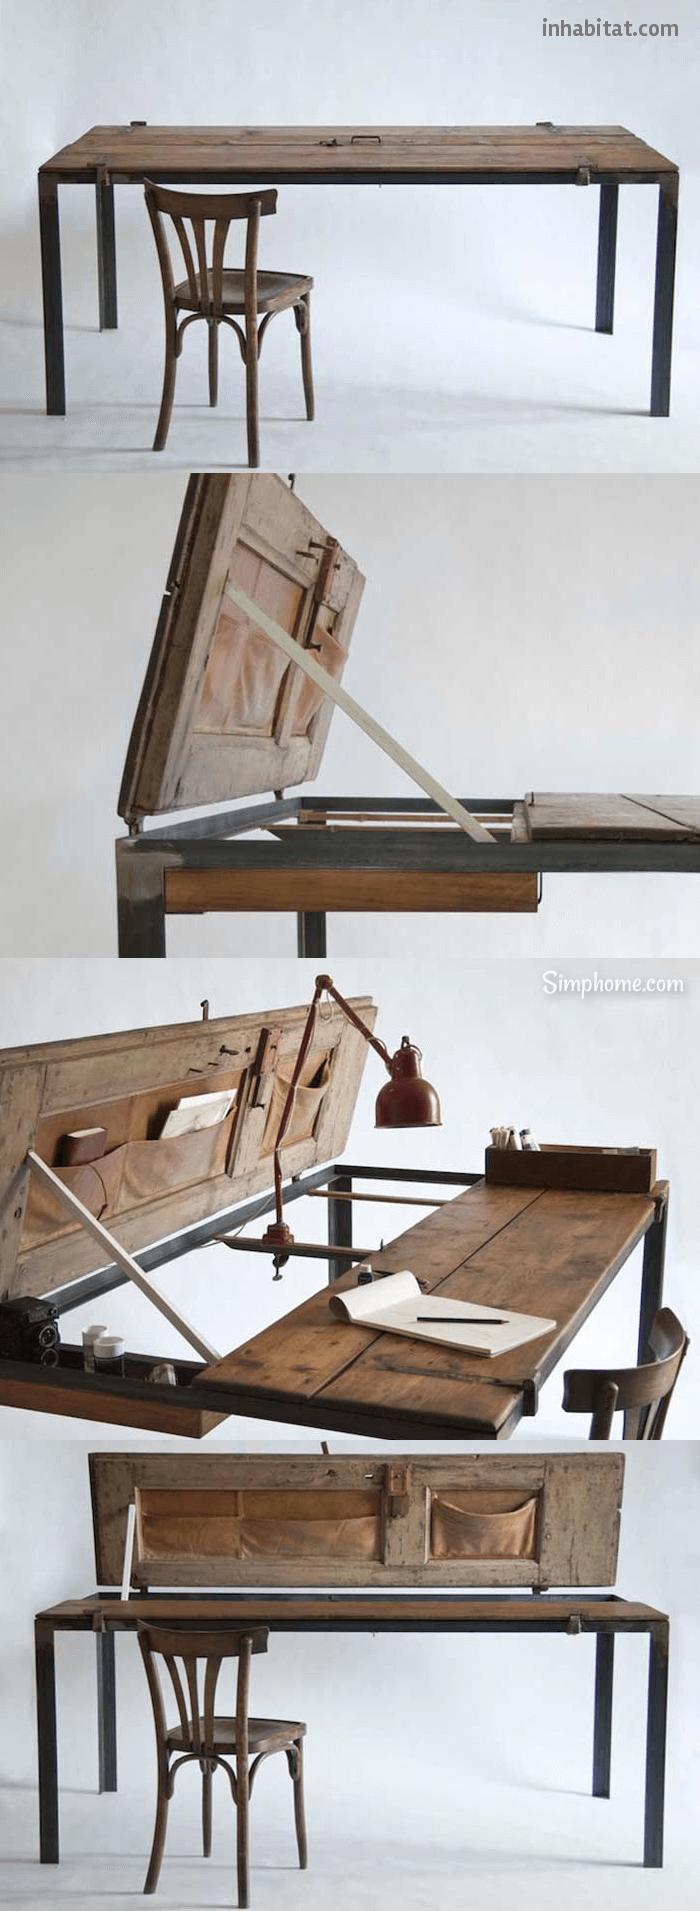 Manoteca Reincarnates a Vintage Door as a Rustic Desk 18 Simphome com p